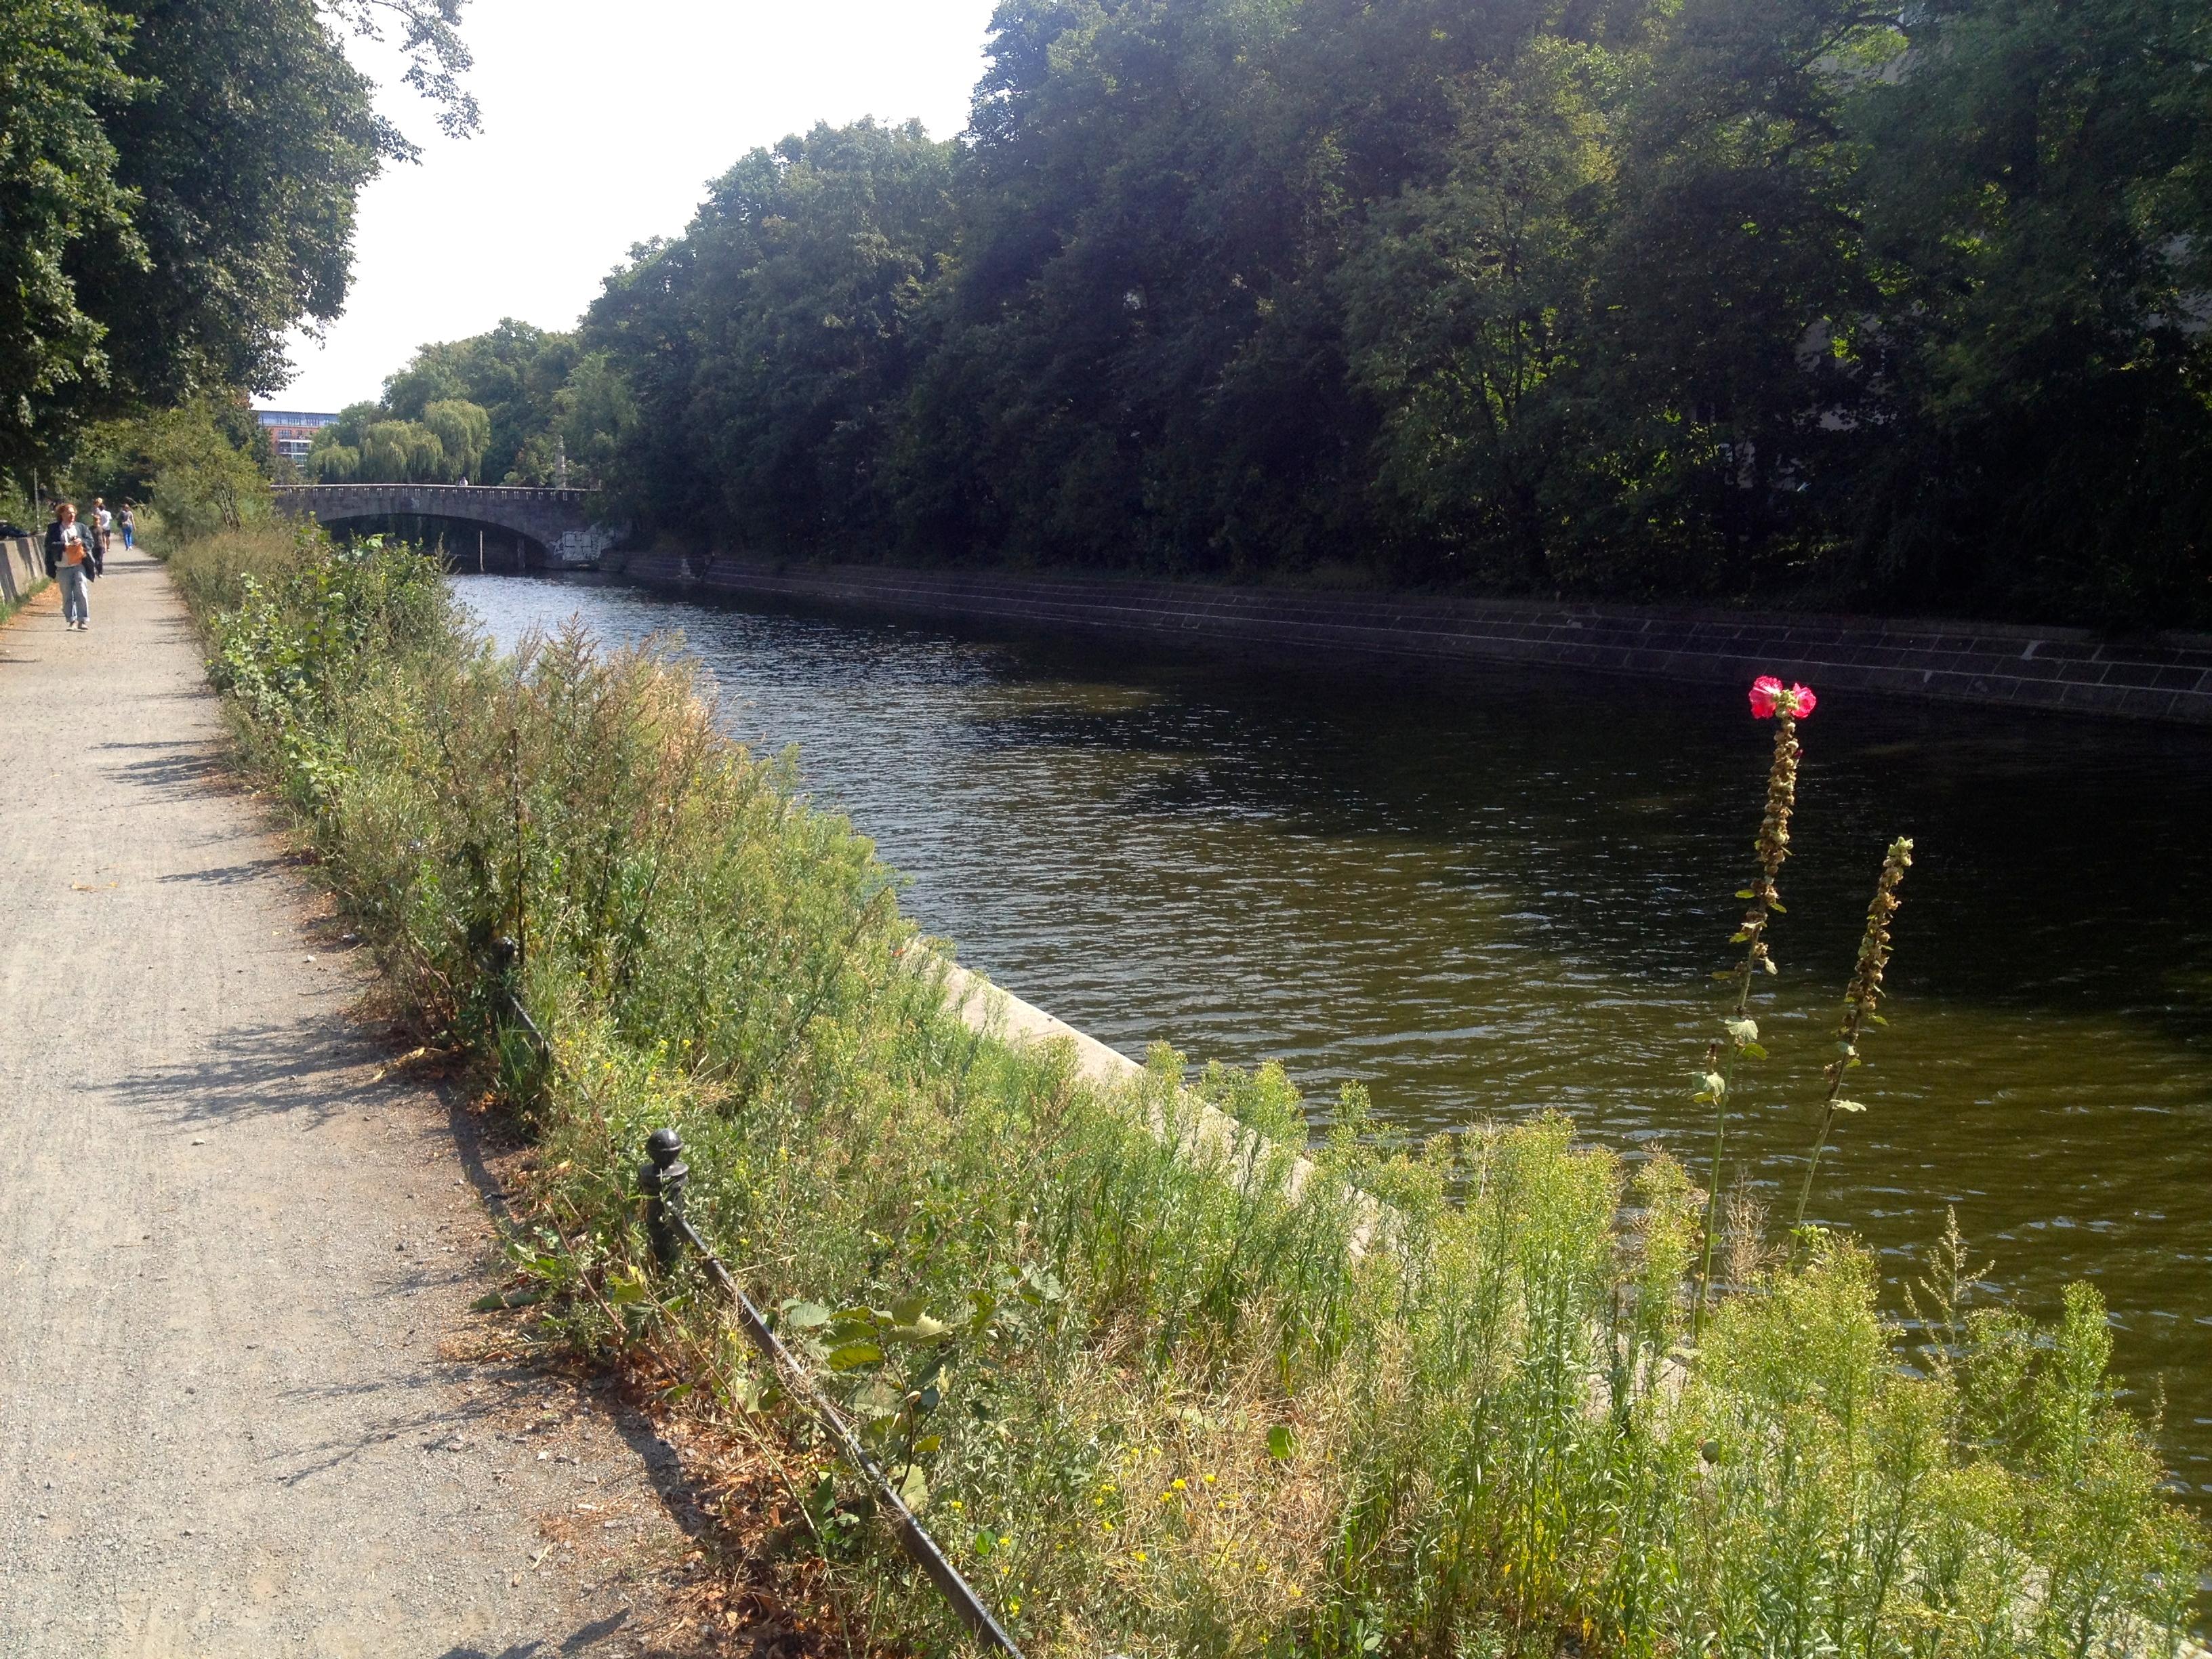 Szenekiez: Maybachufer und Paul-Lincke-Ufer